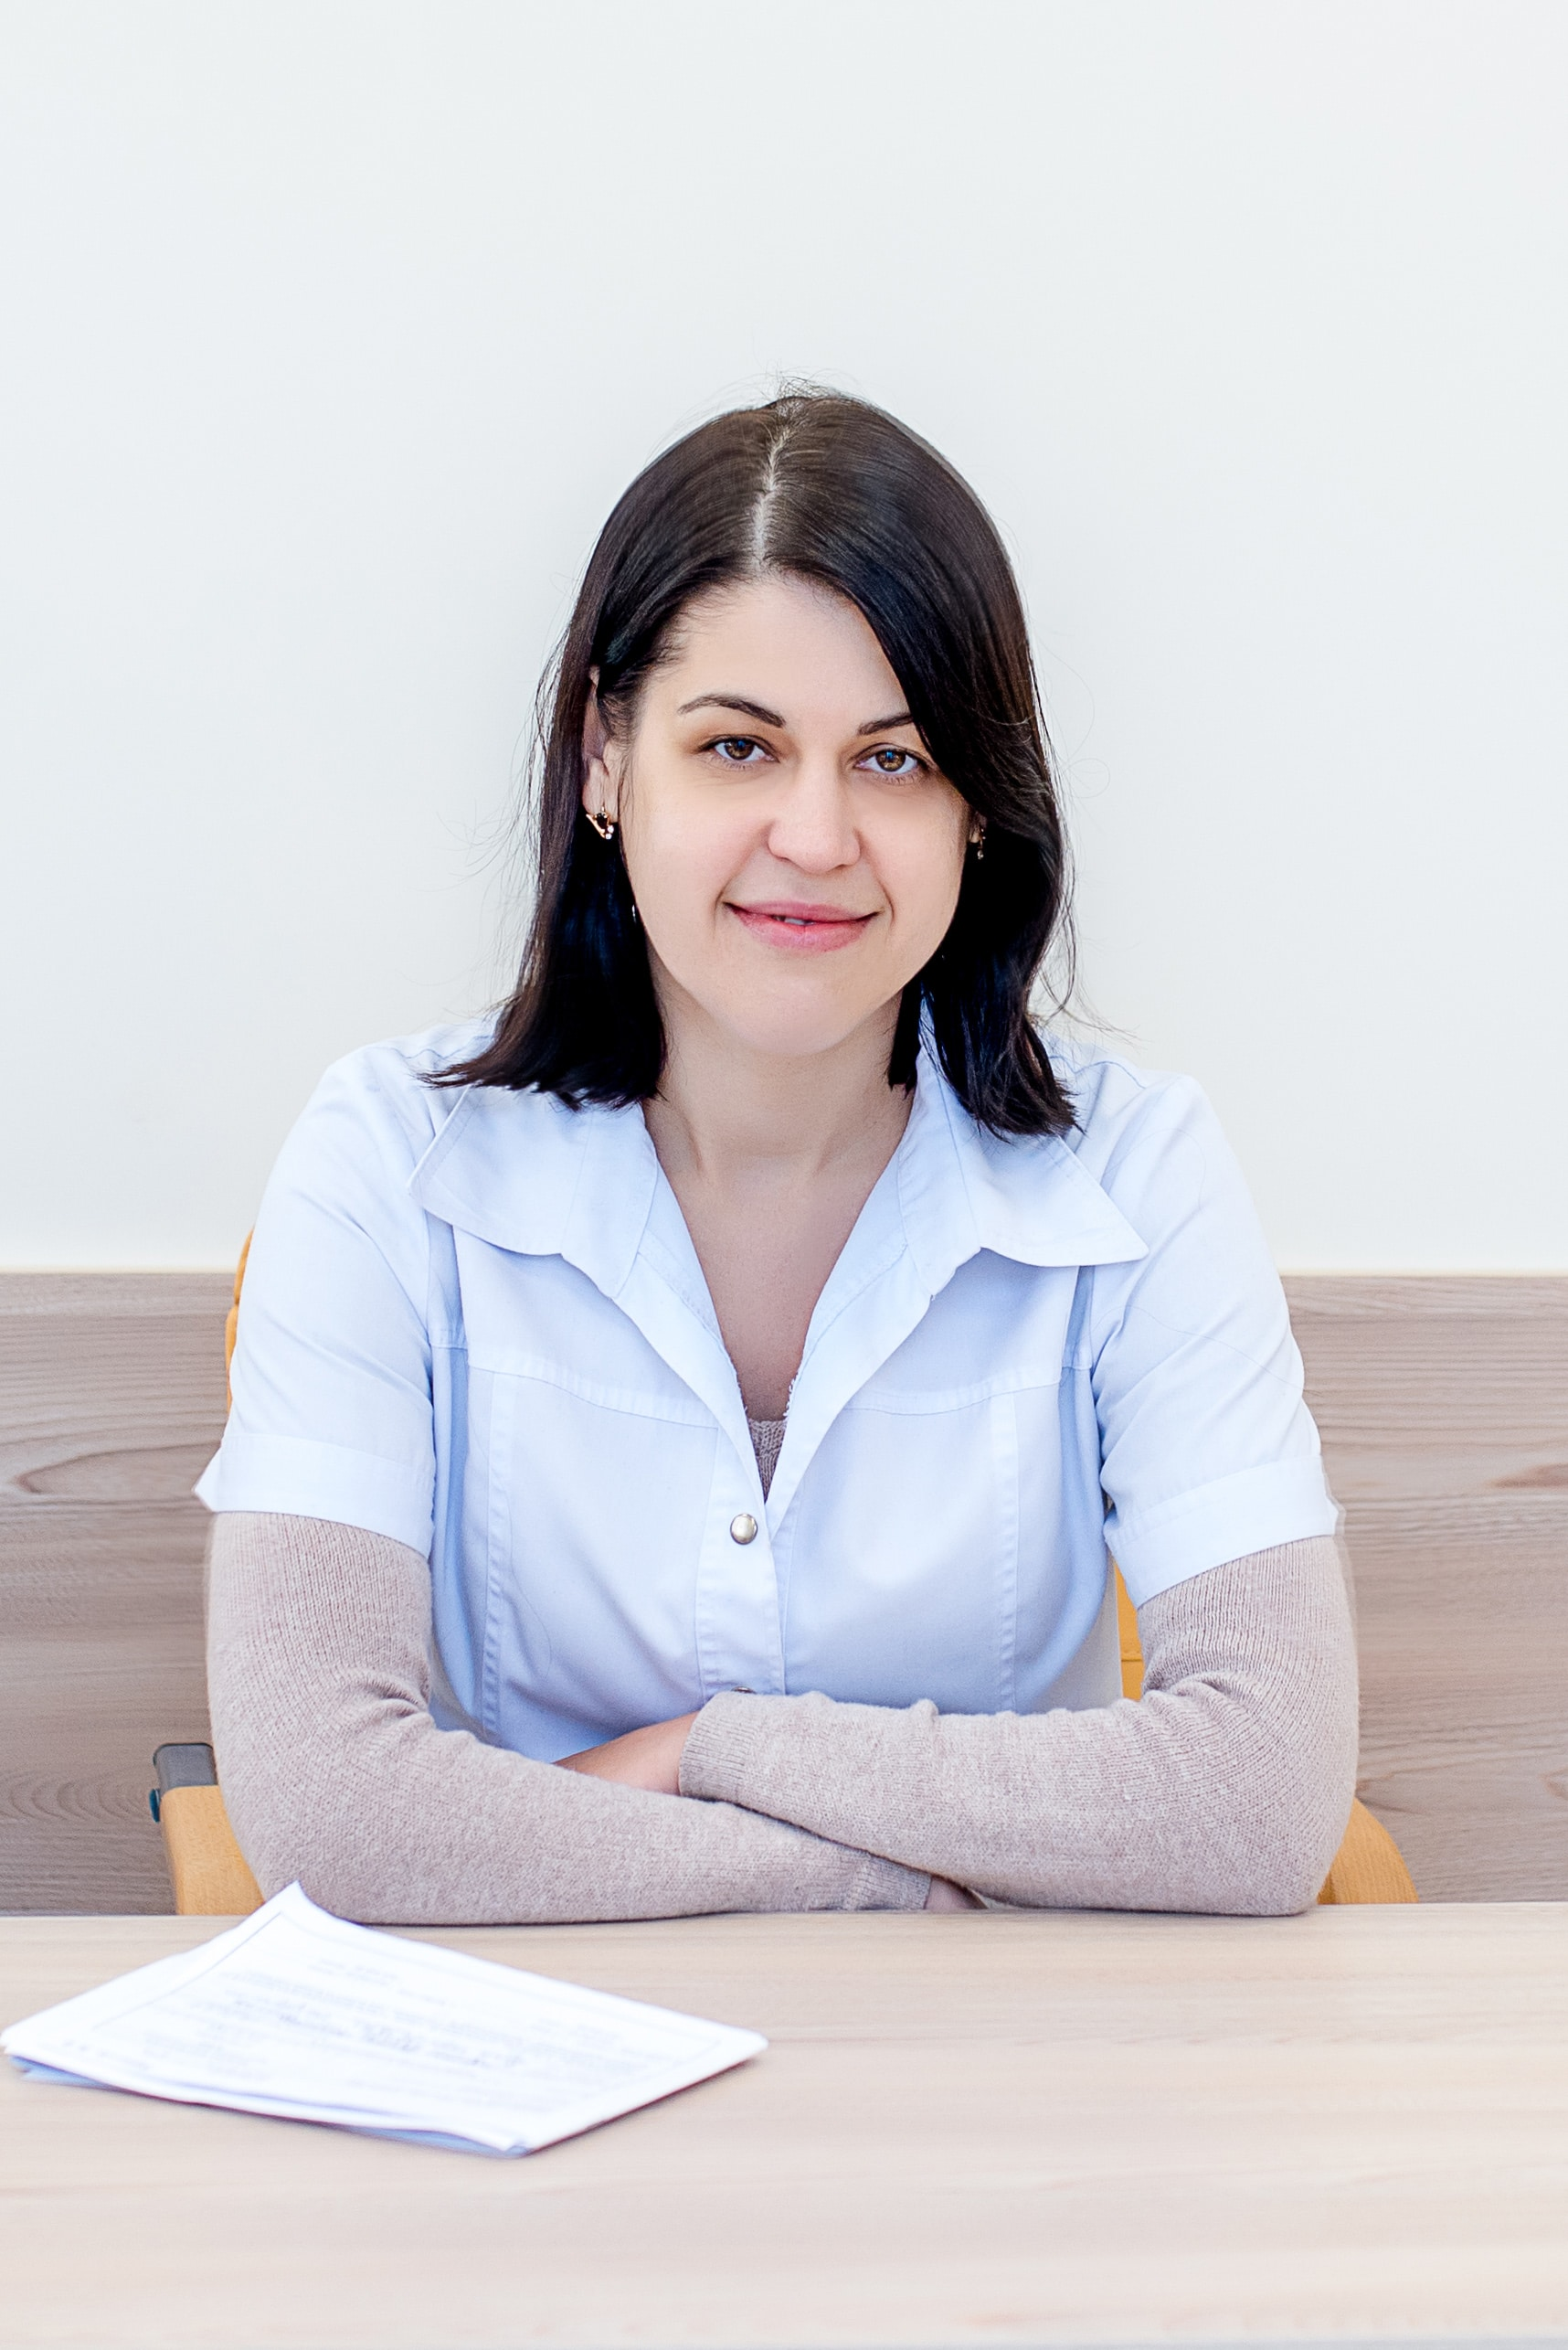 Олешко Екатерина Михайловна